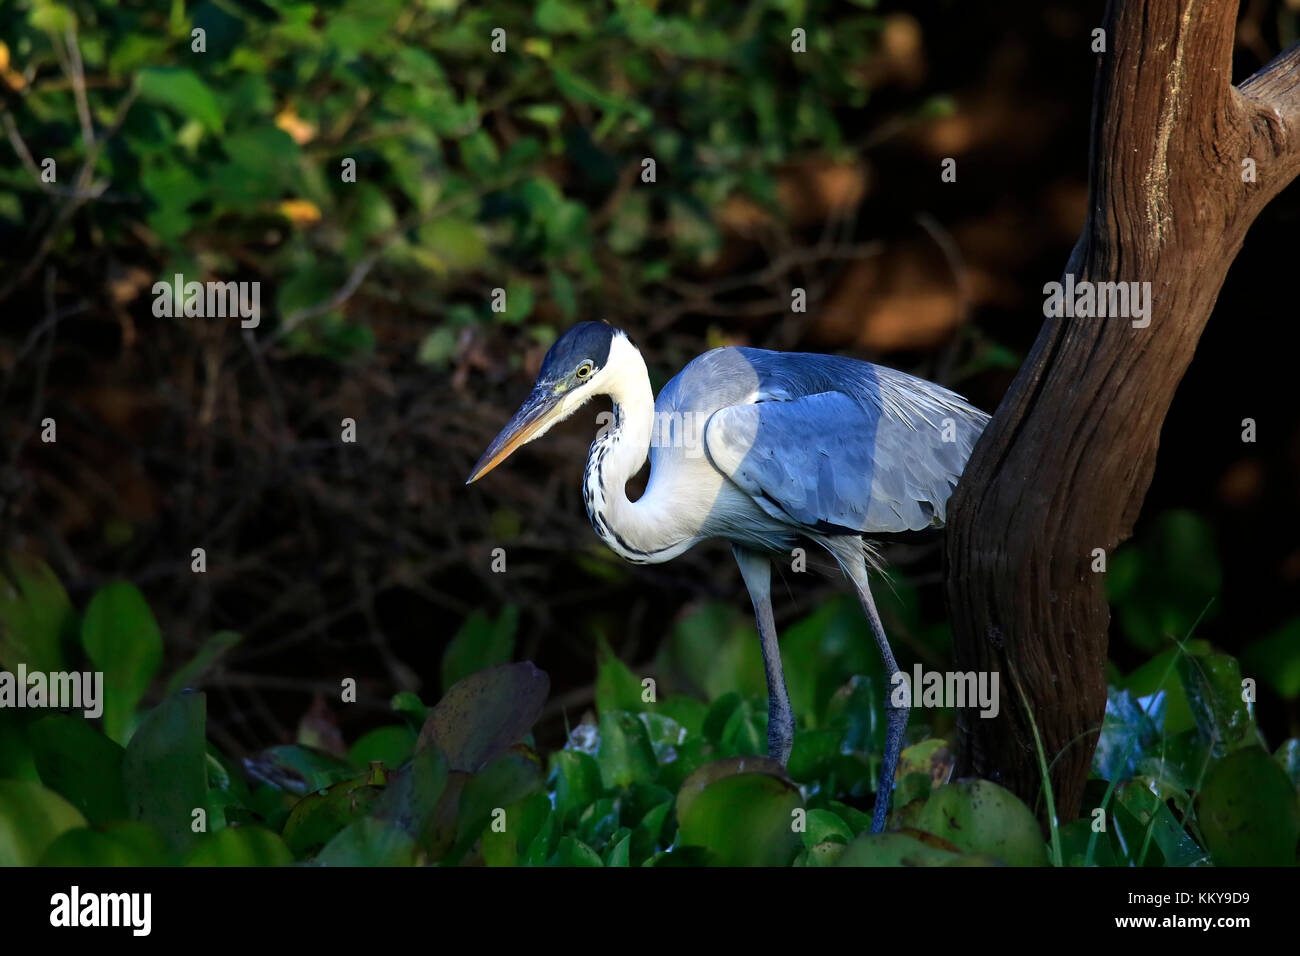 Cocoi Heron at Rio Claro. Pantanal, Brazil - Stock Image